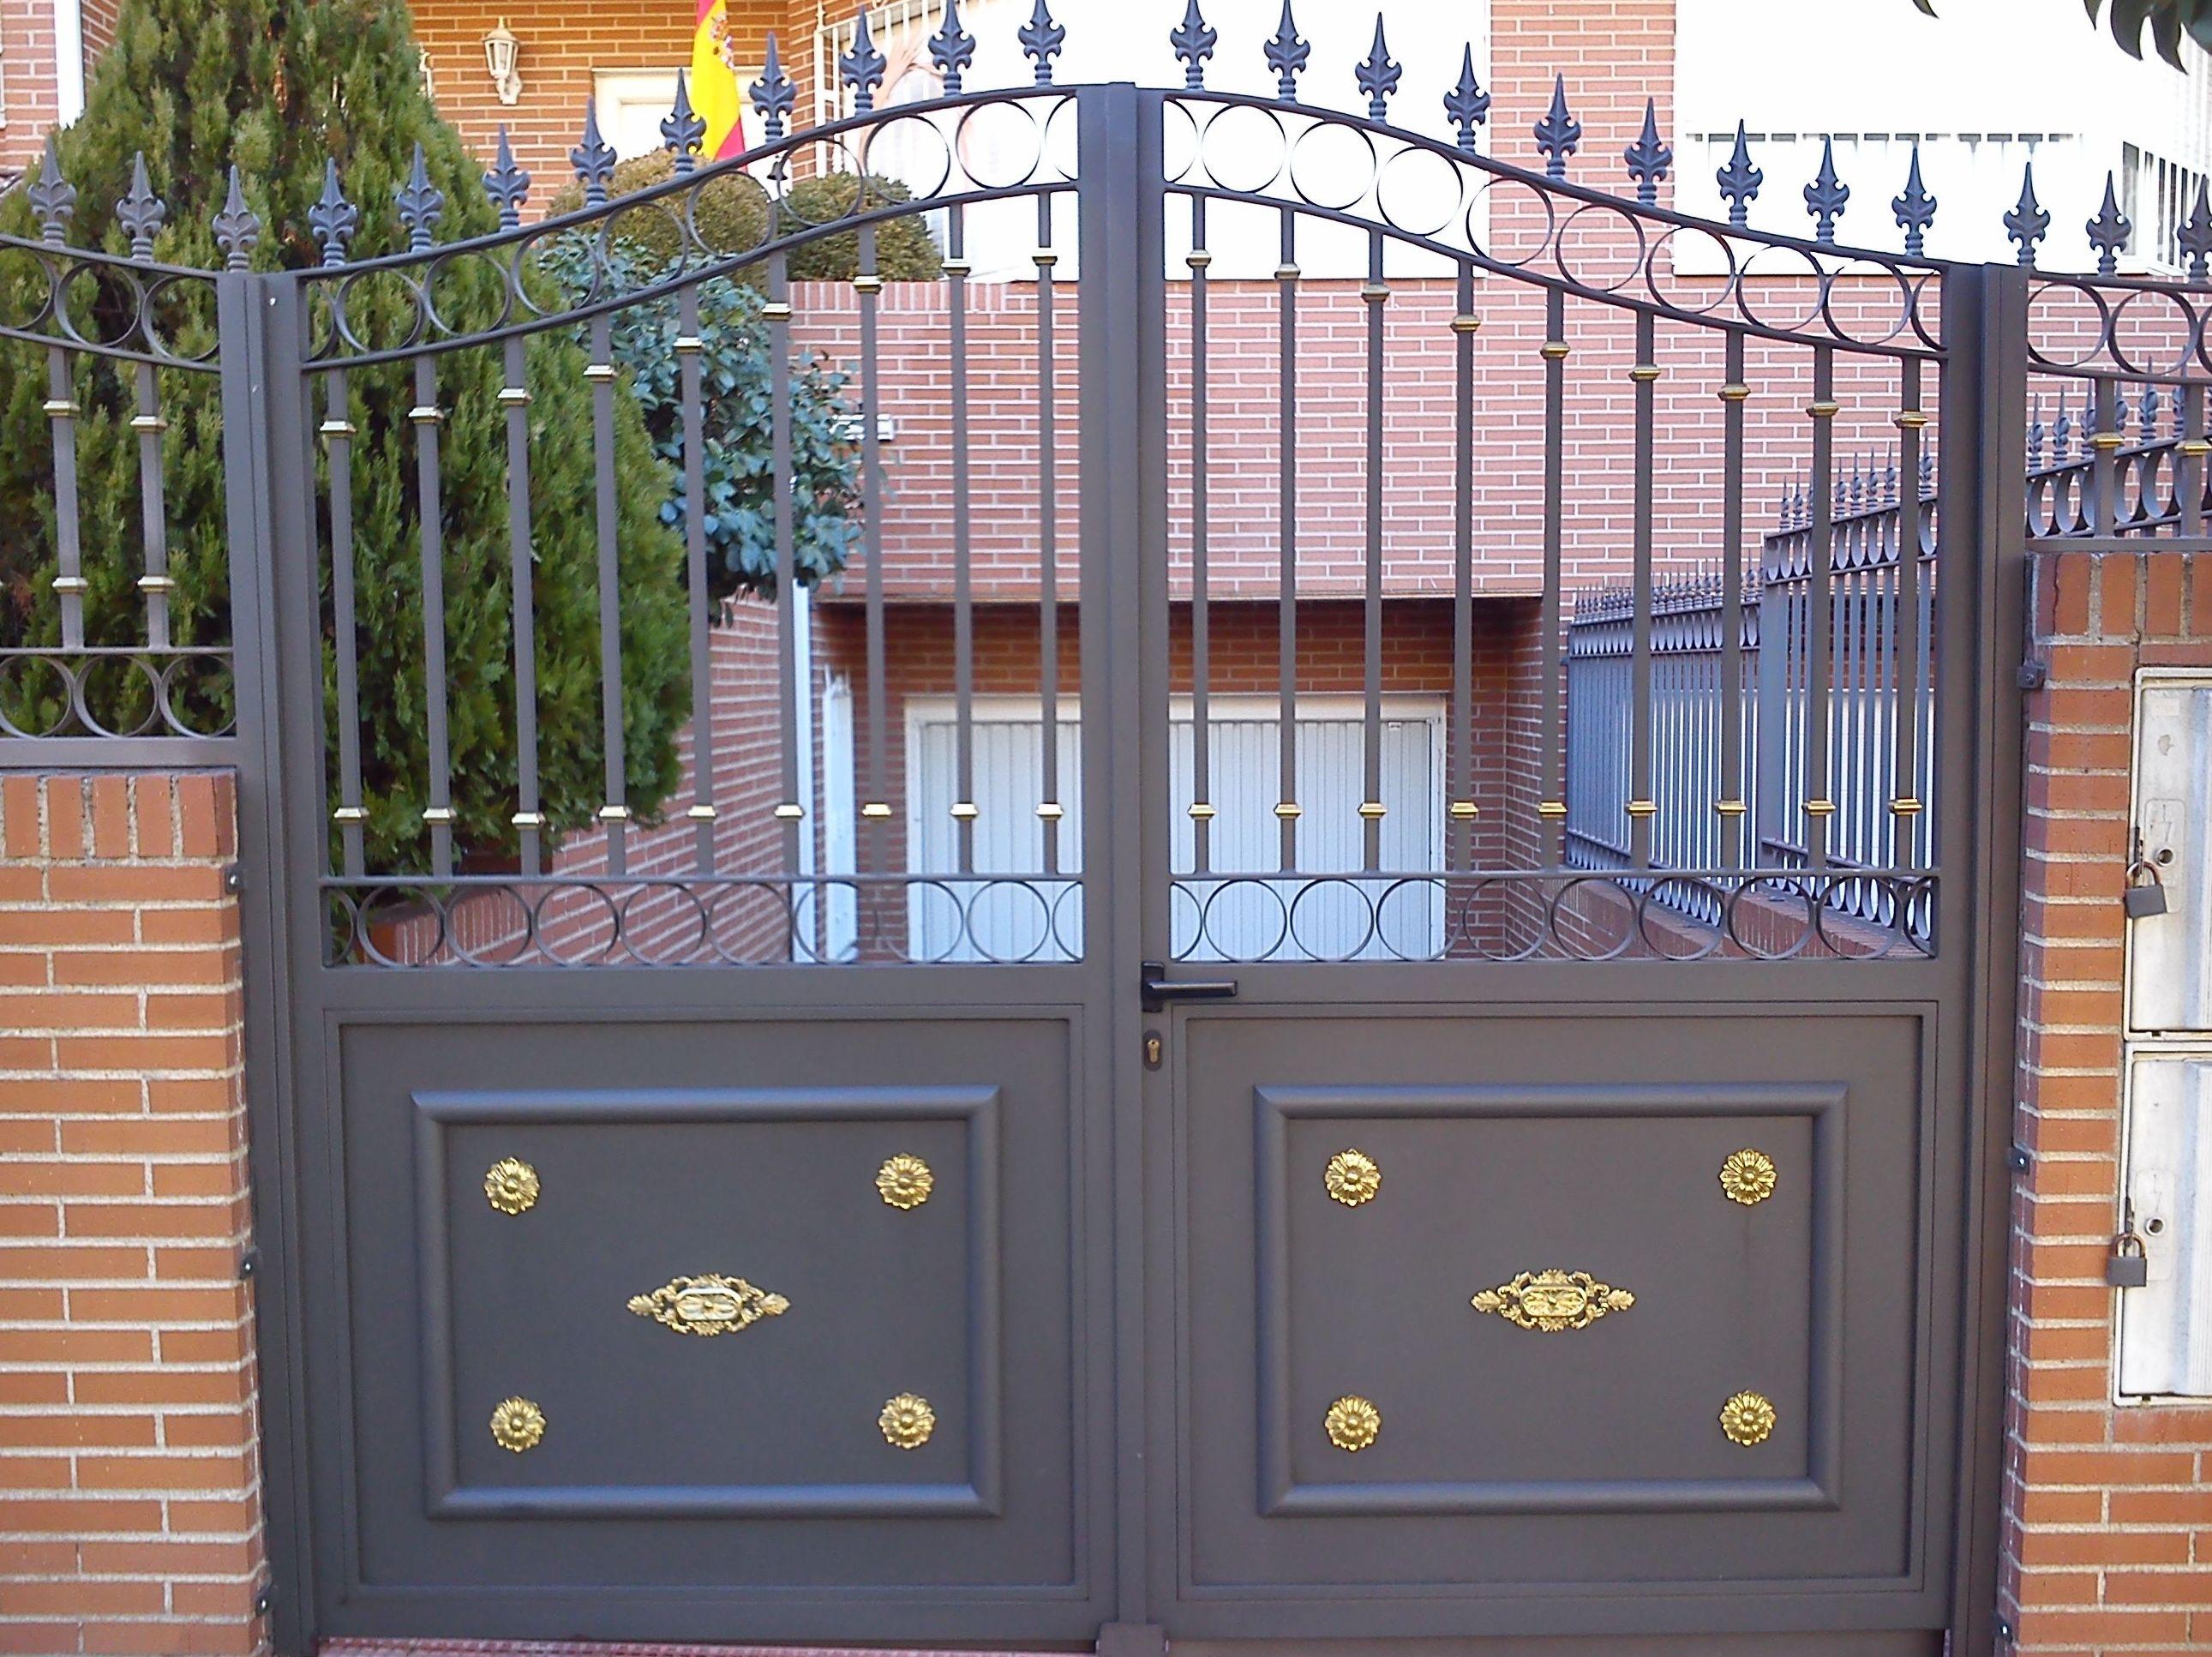 P31 - Puerta de acceso a garaje